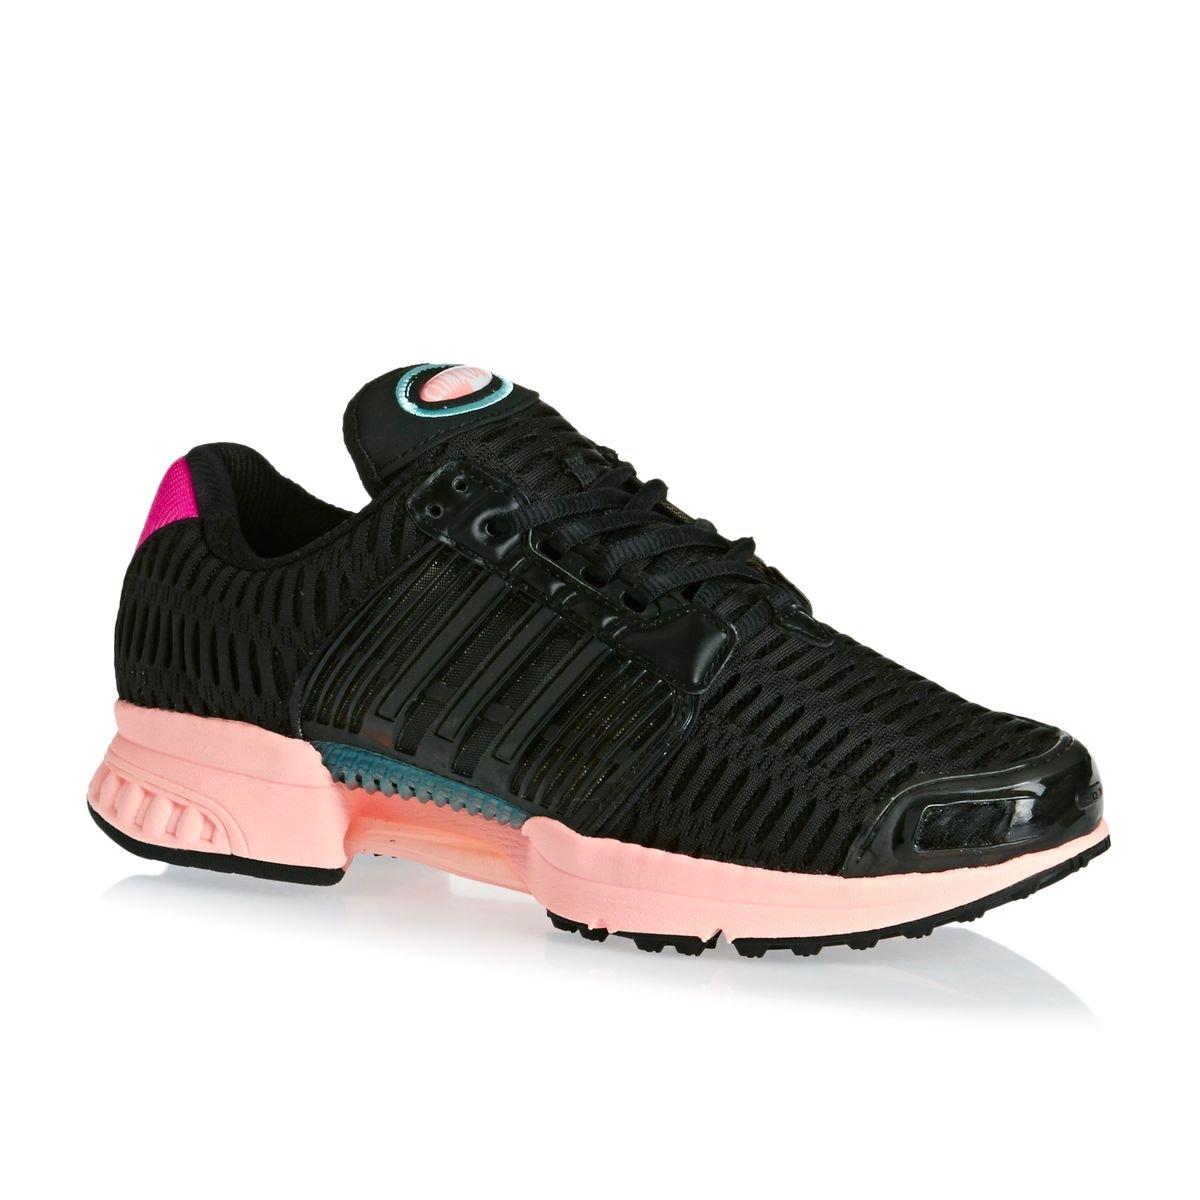 Adidas Climacool 1 Damen Turnschuhe Schwarz